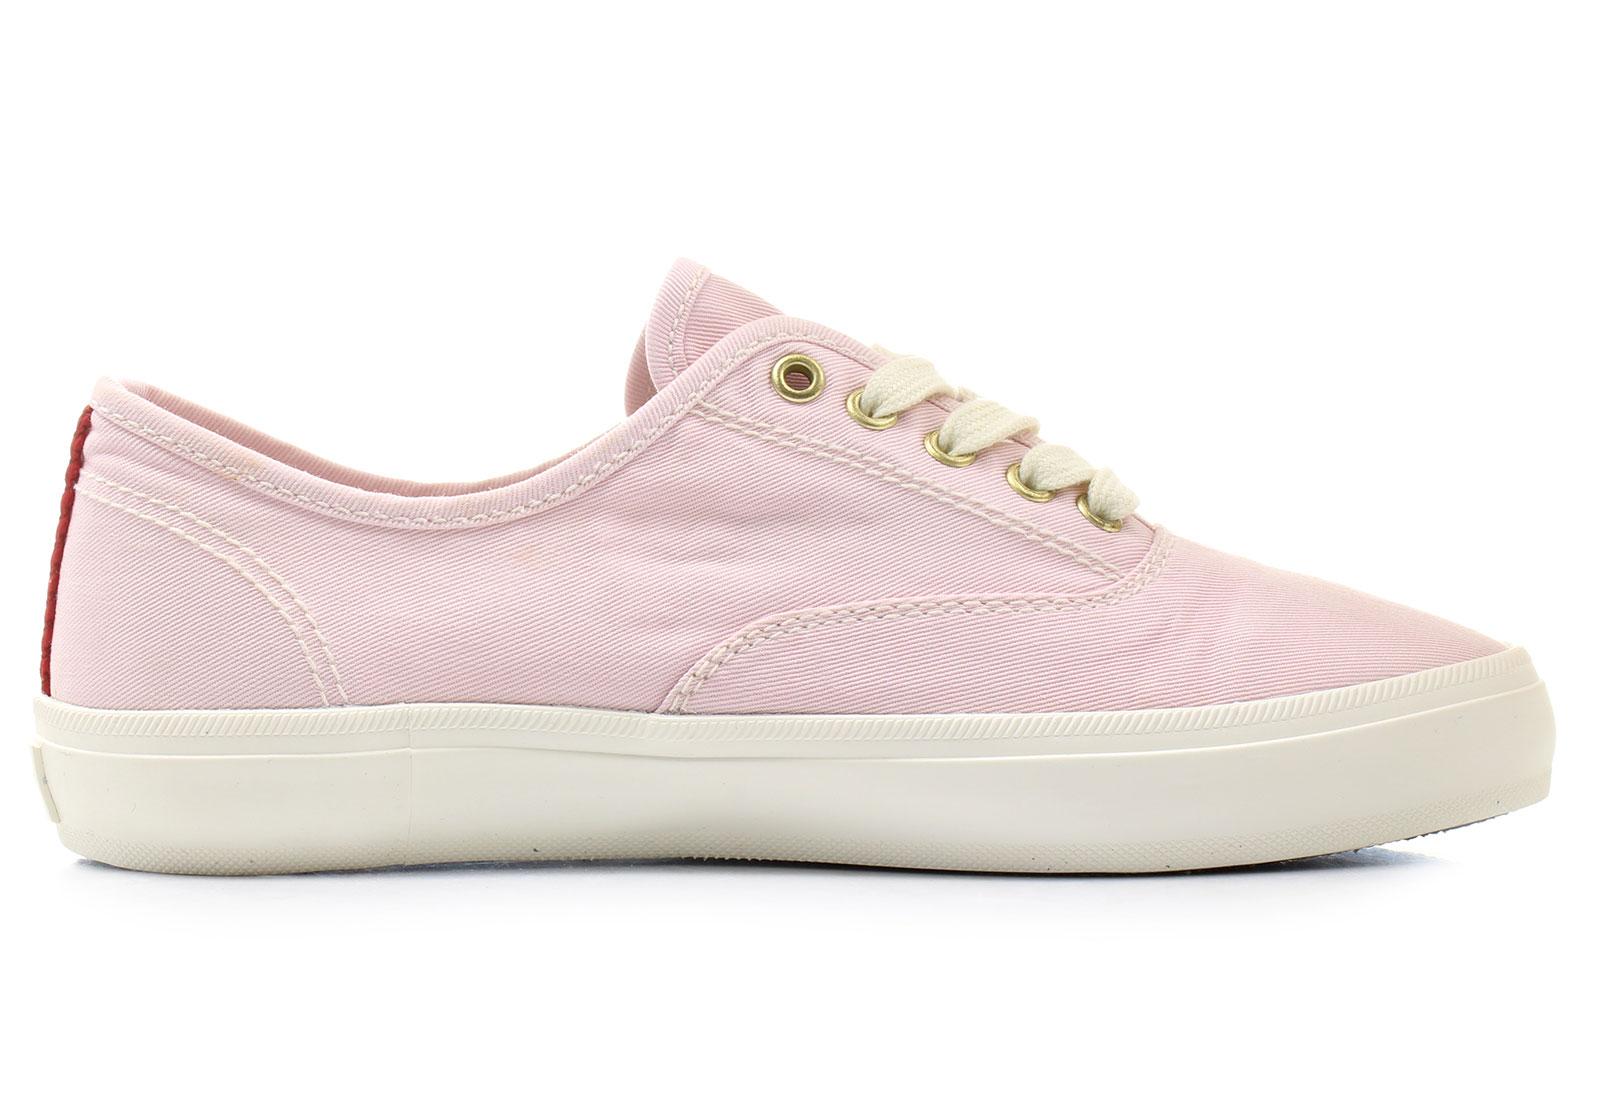 Gant Sneakers Zoe 12538161 G580 Online Shop For